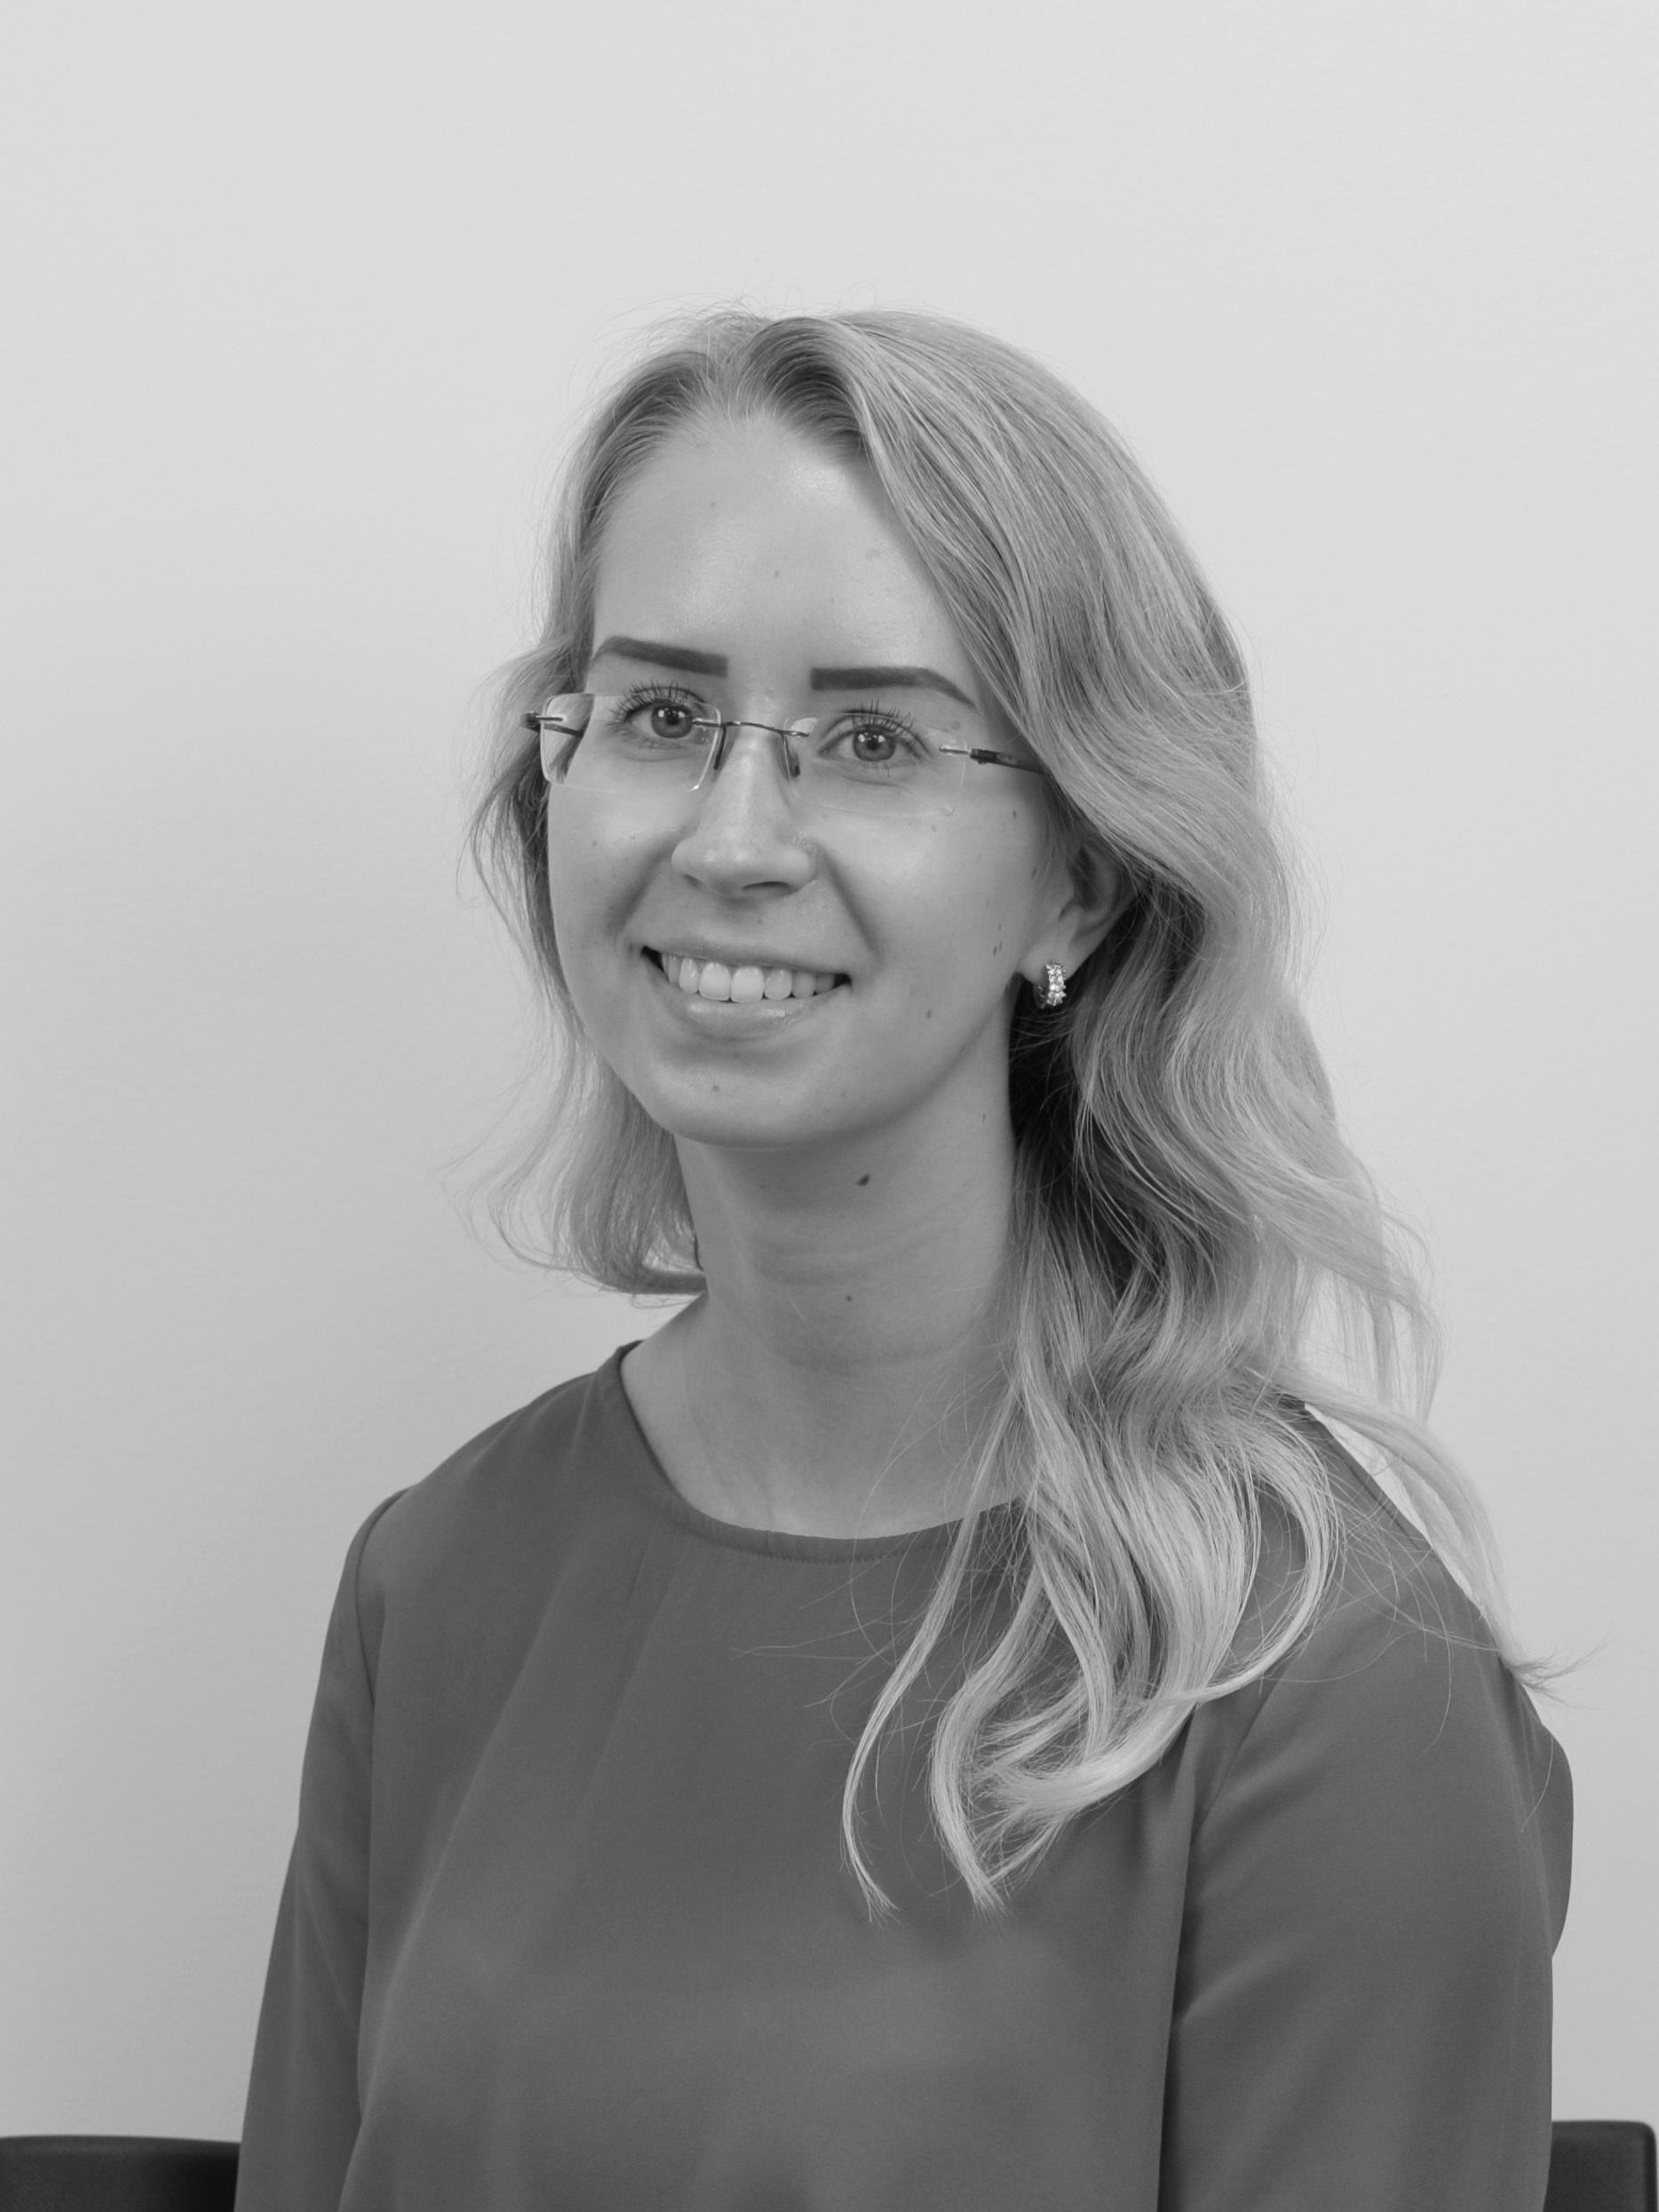 Greenstep (fi) - Heini Savolainen